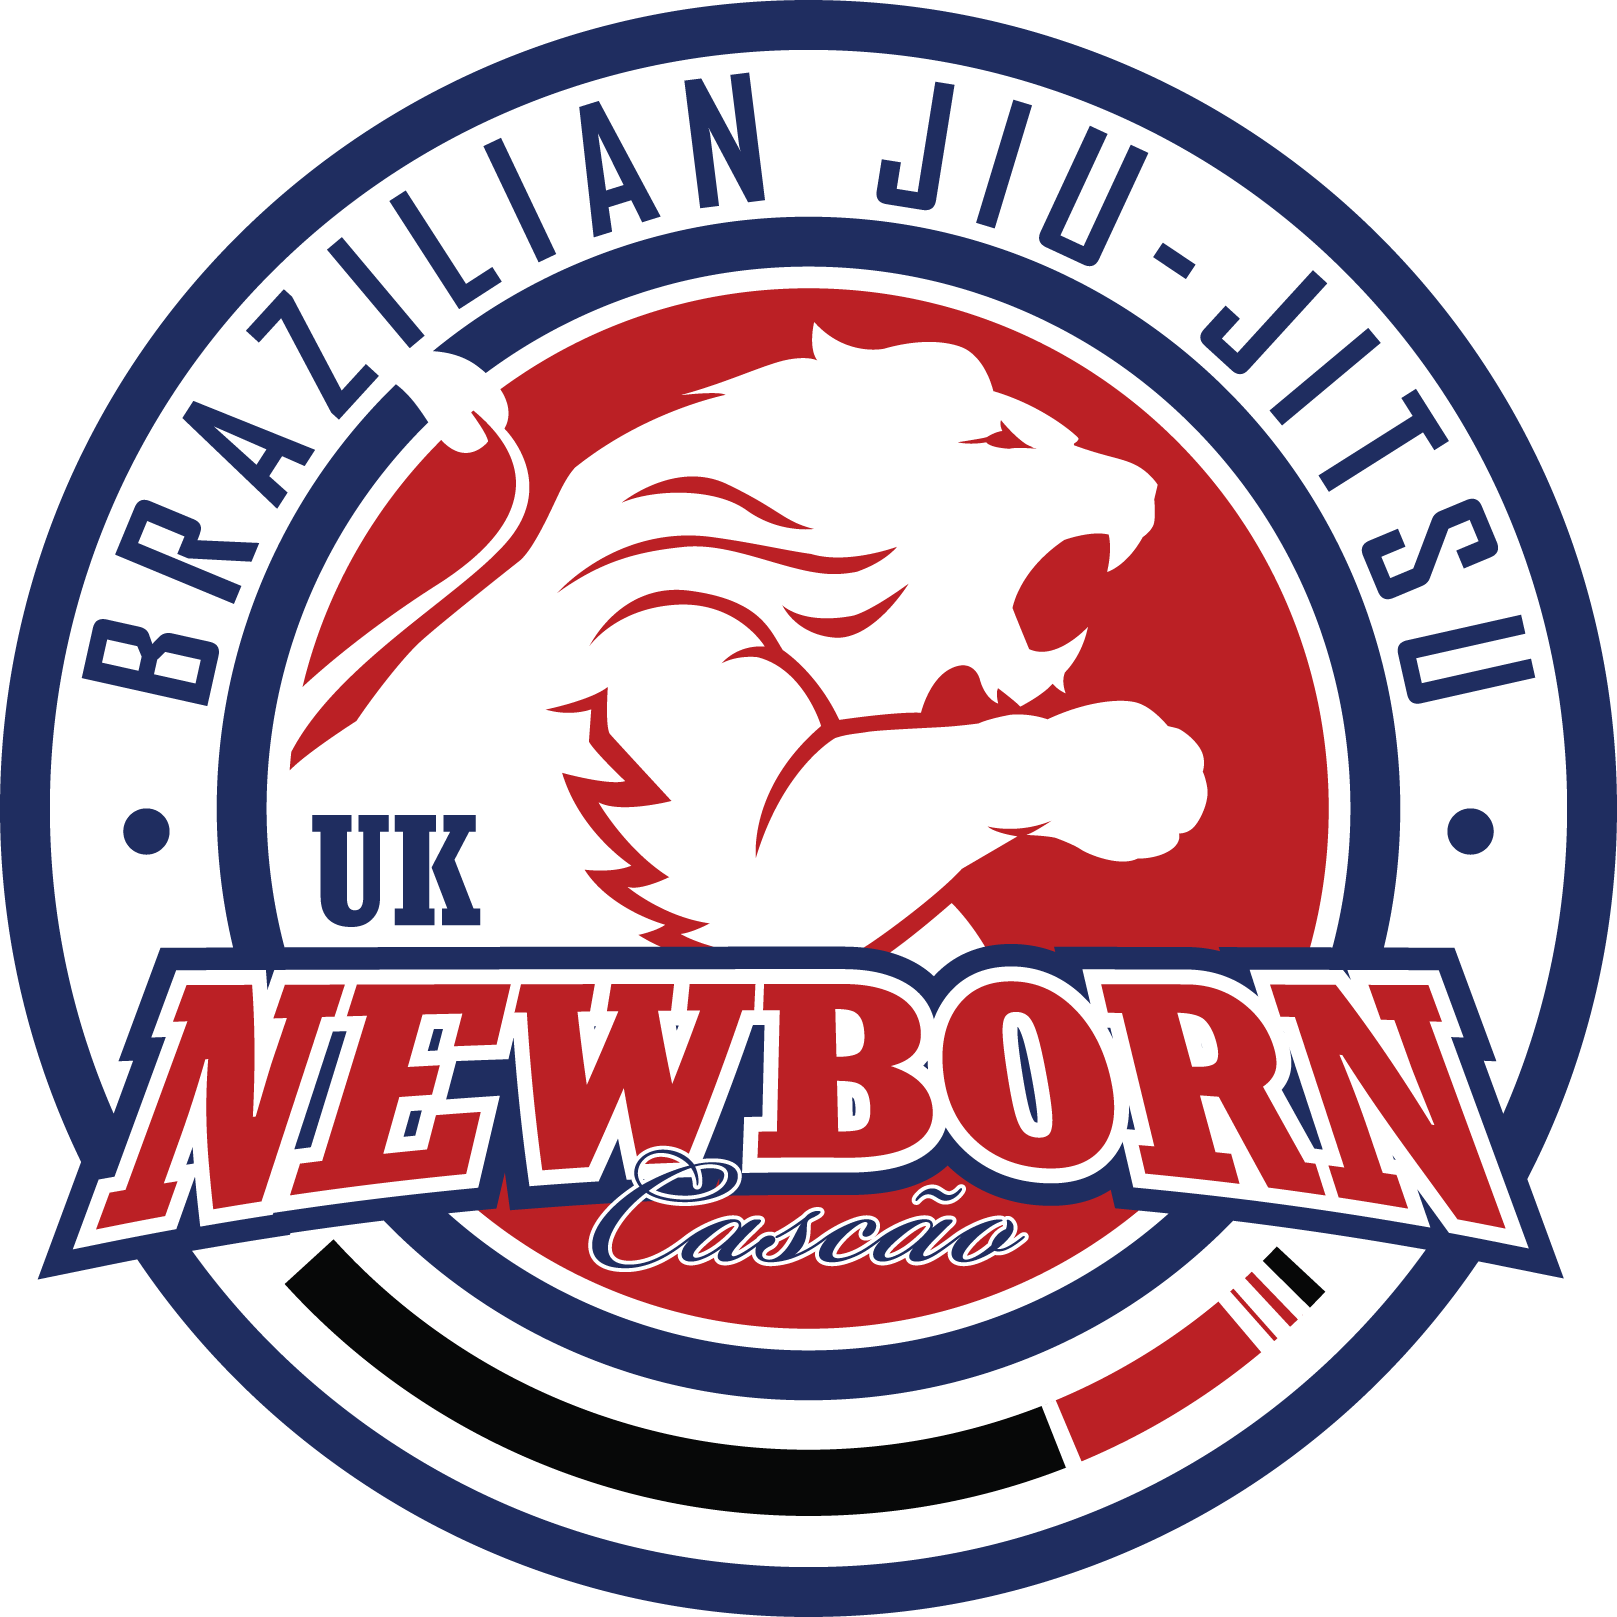 Newborn Cascao UK Team Logo